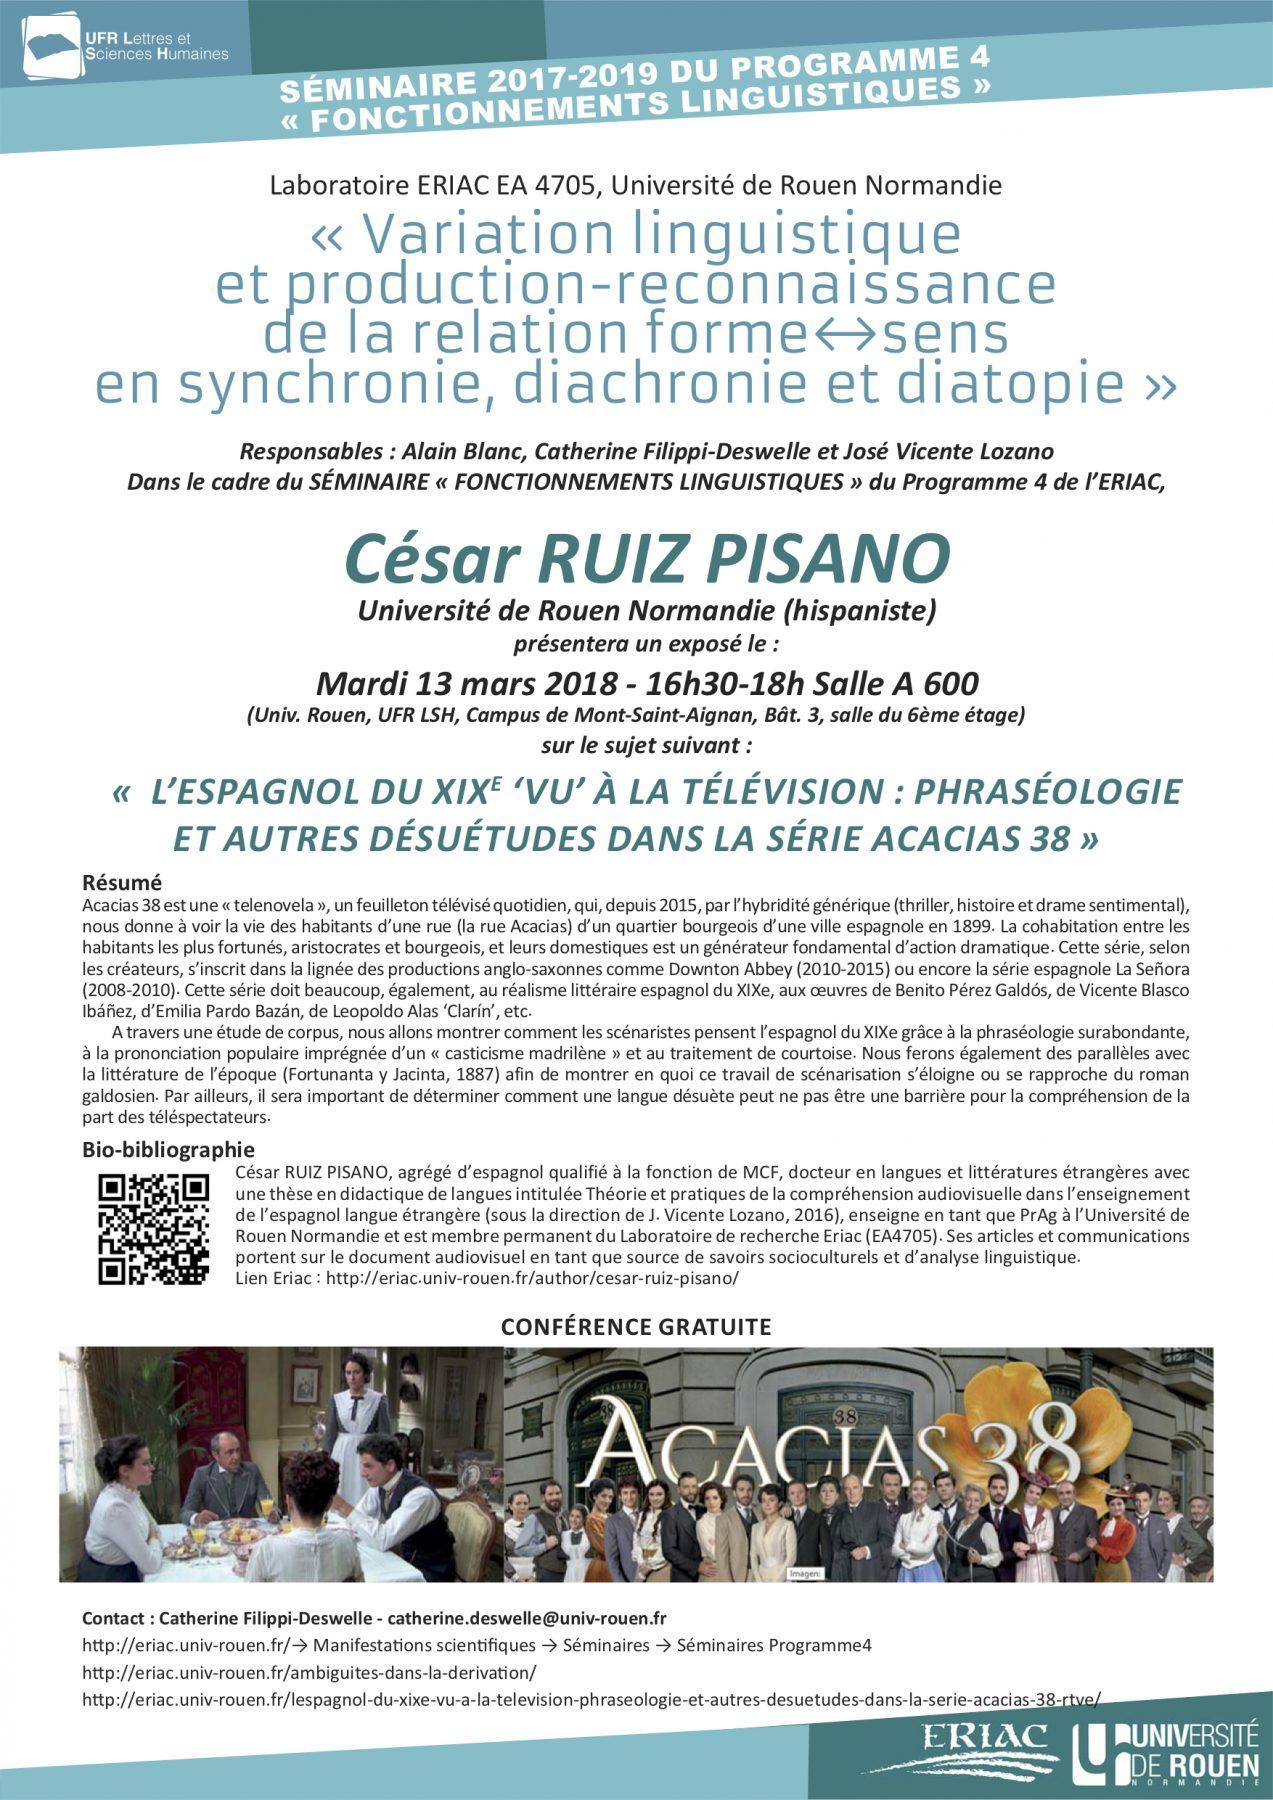 ERIAC-affiche-César-RUIZ-PISANO-13-mars-2018-Variation-linguistique-1273x1800